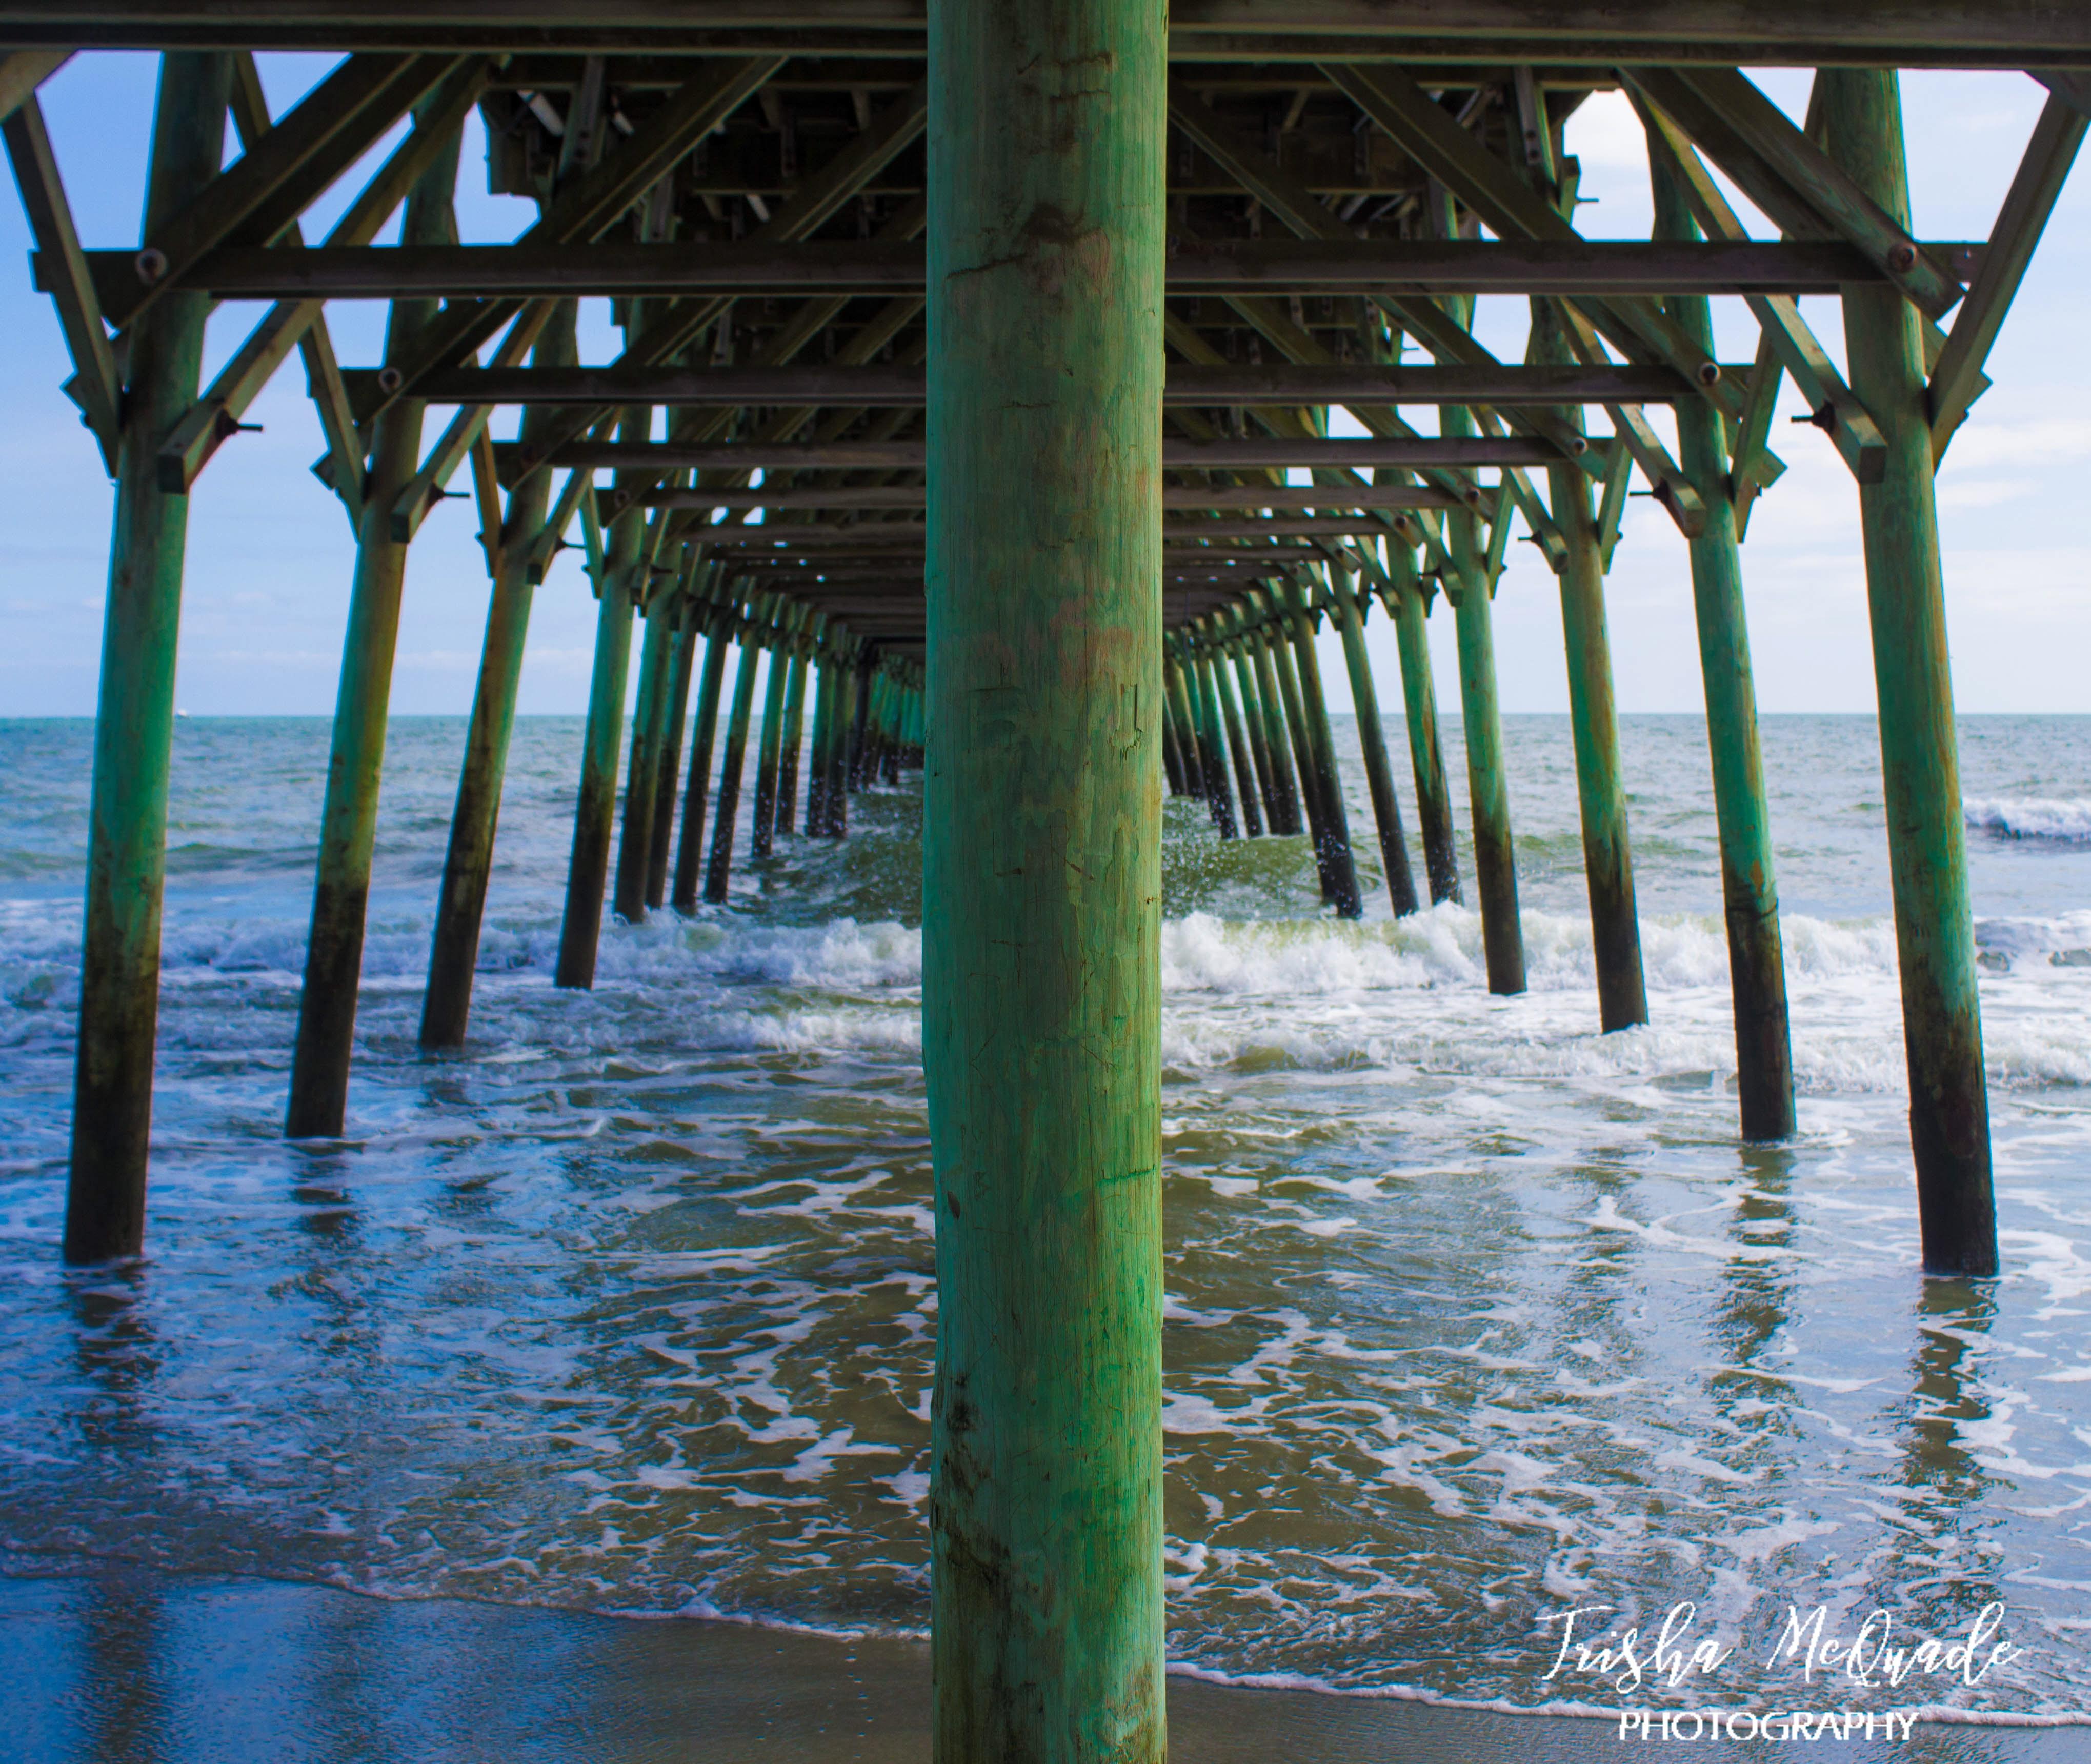 Vibrant Green Pier